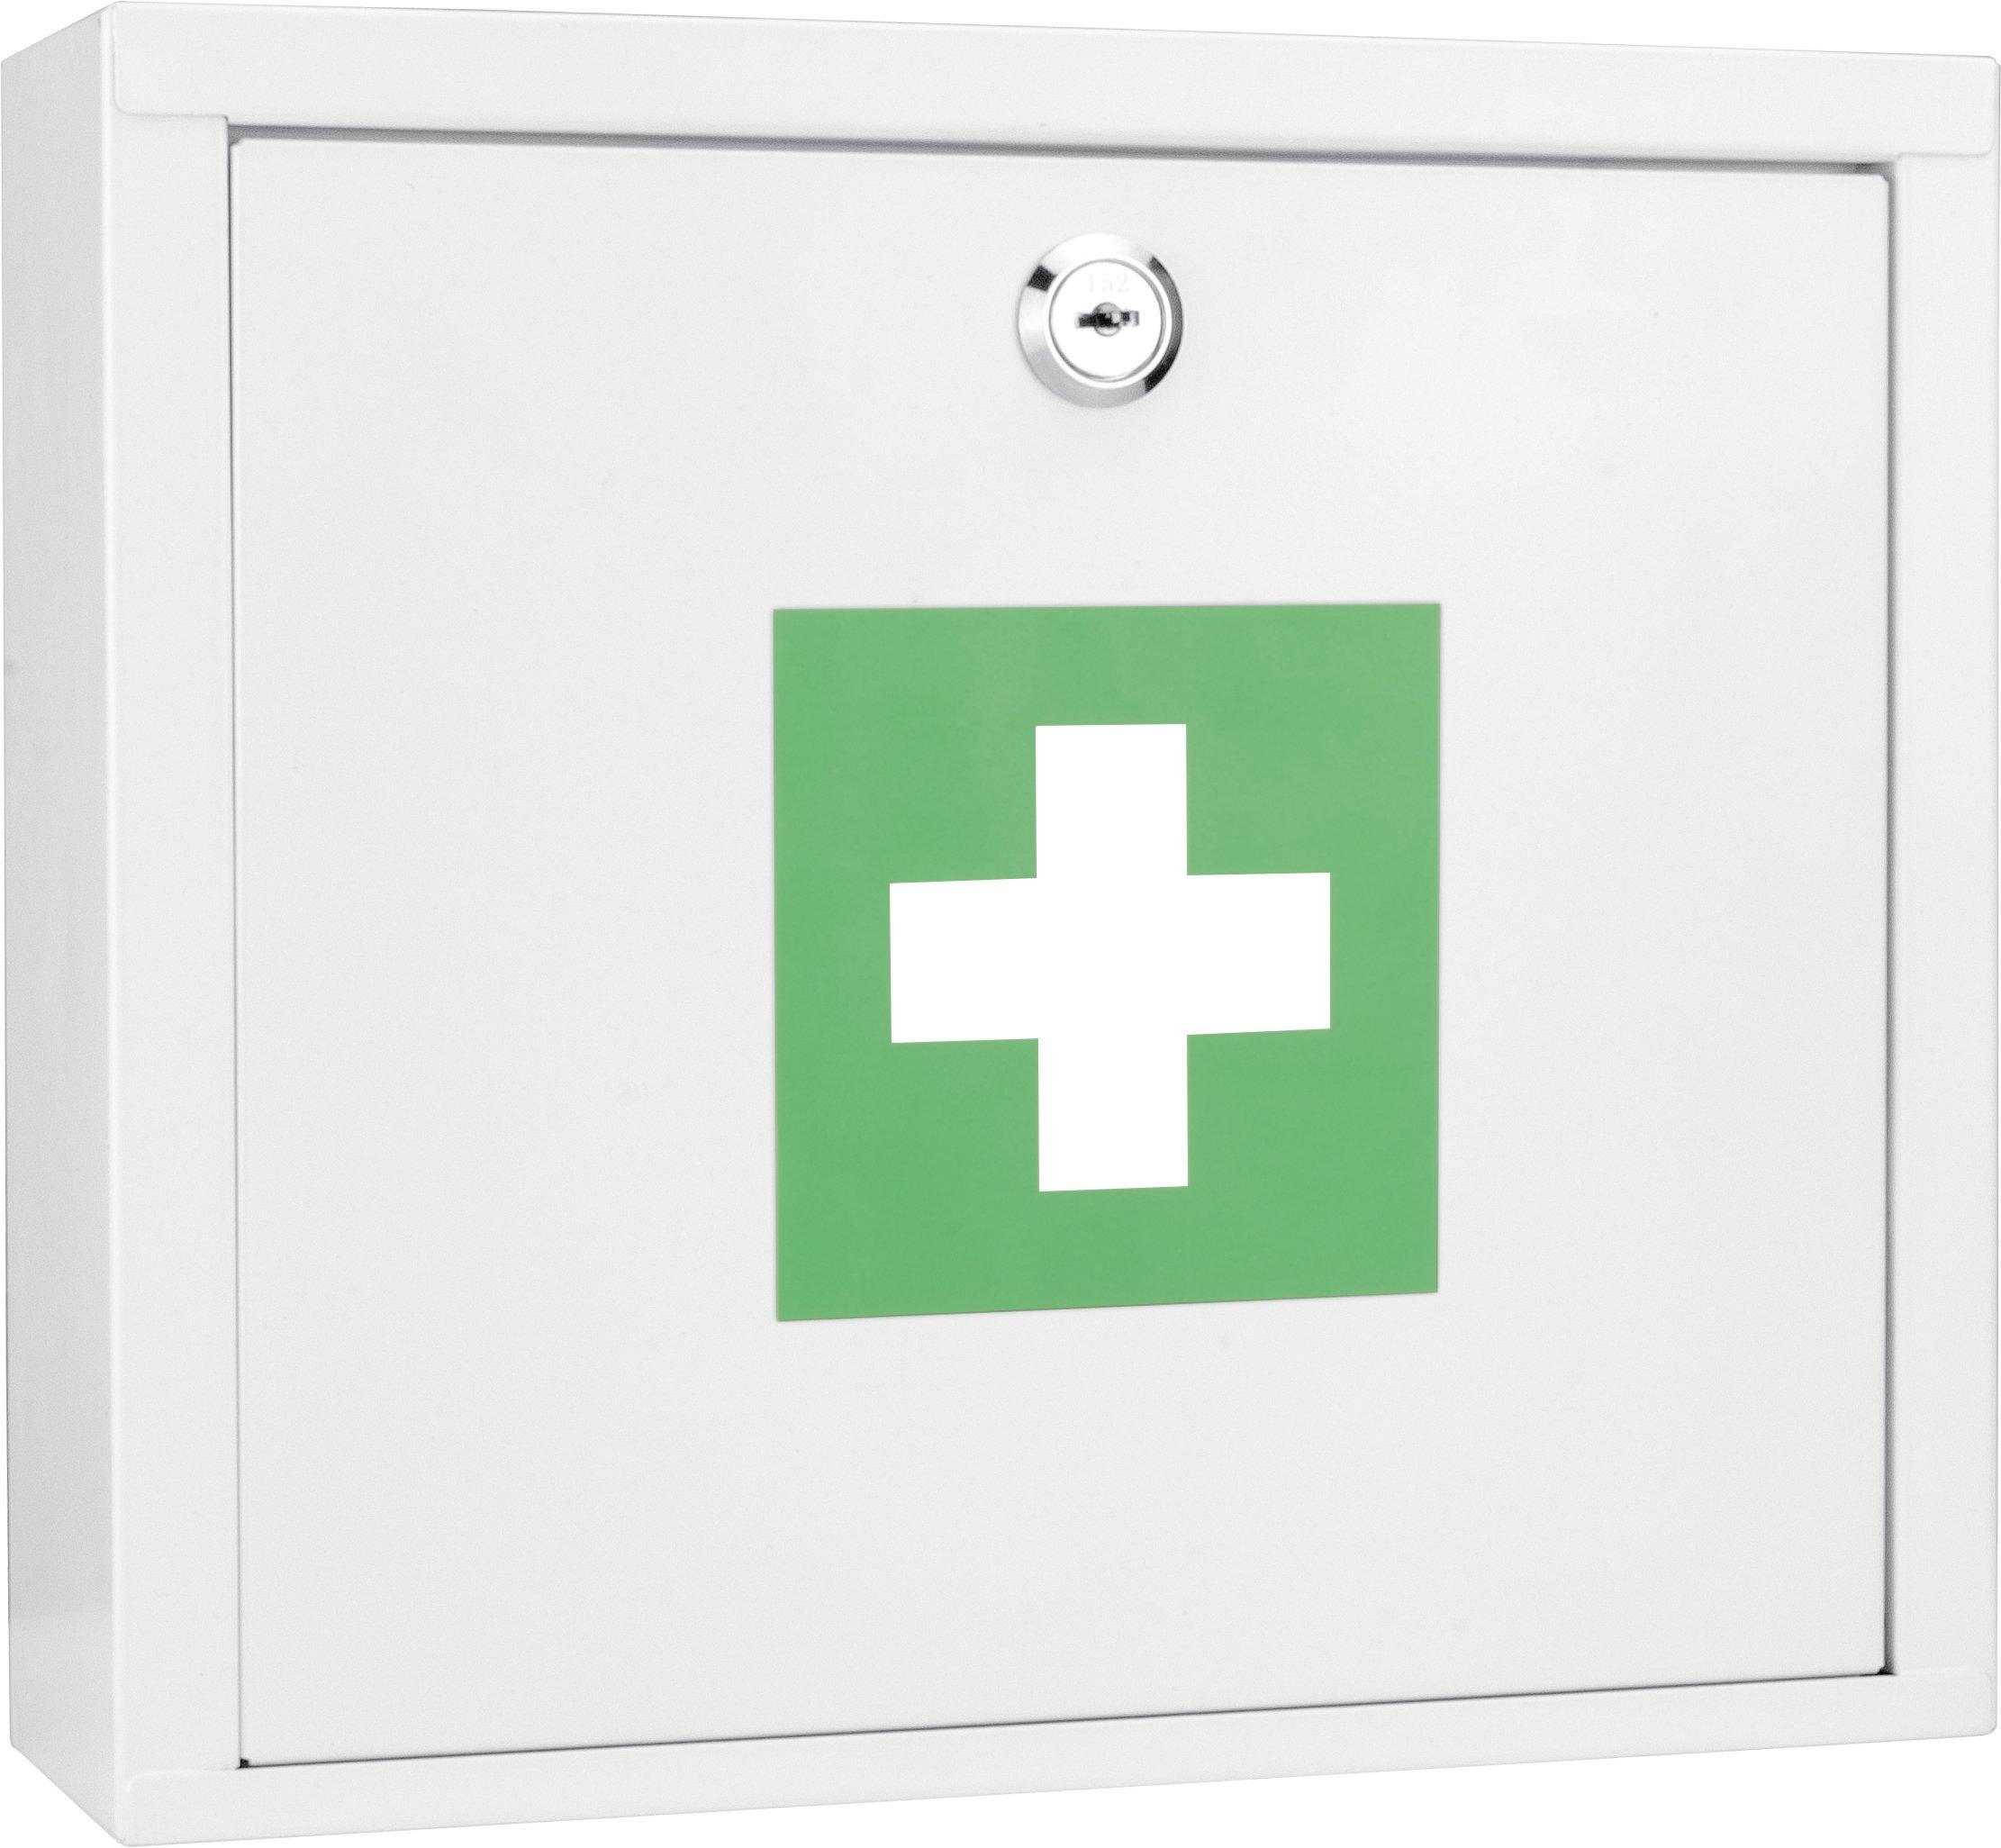 Winbest Wall Mount Steel Medical Medicine Cabinet